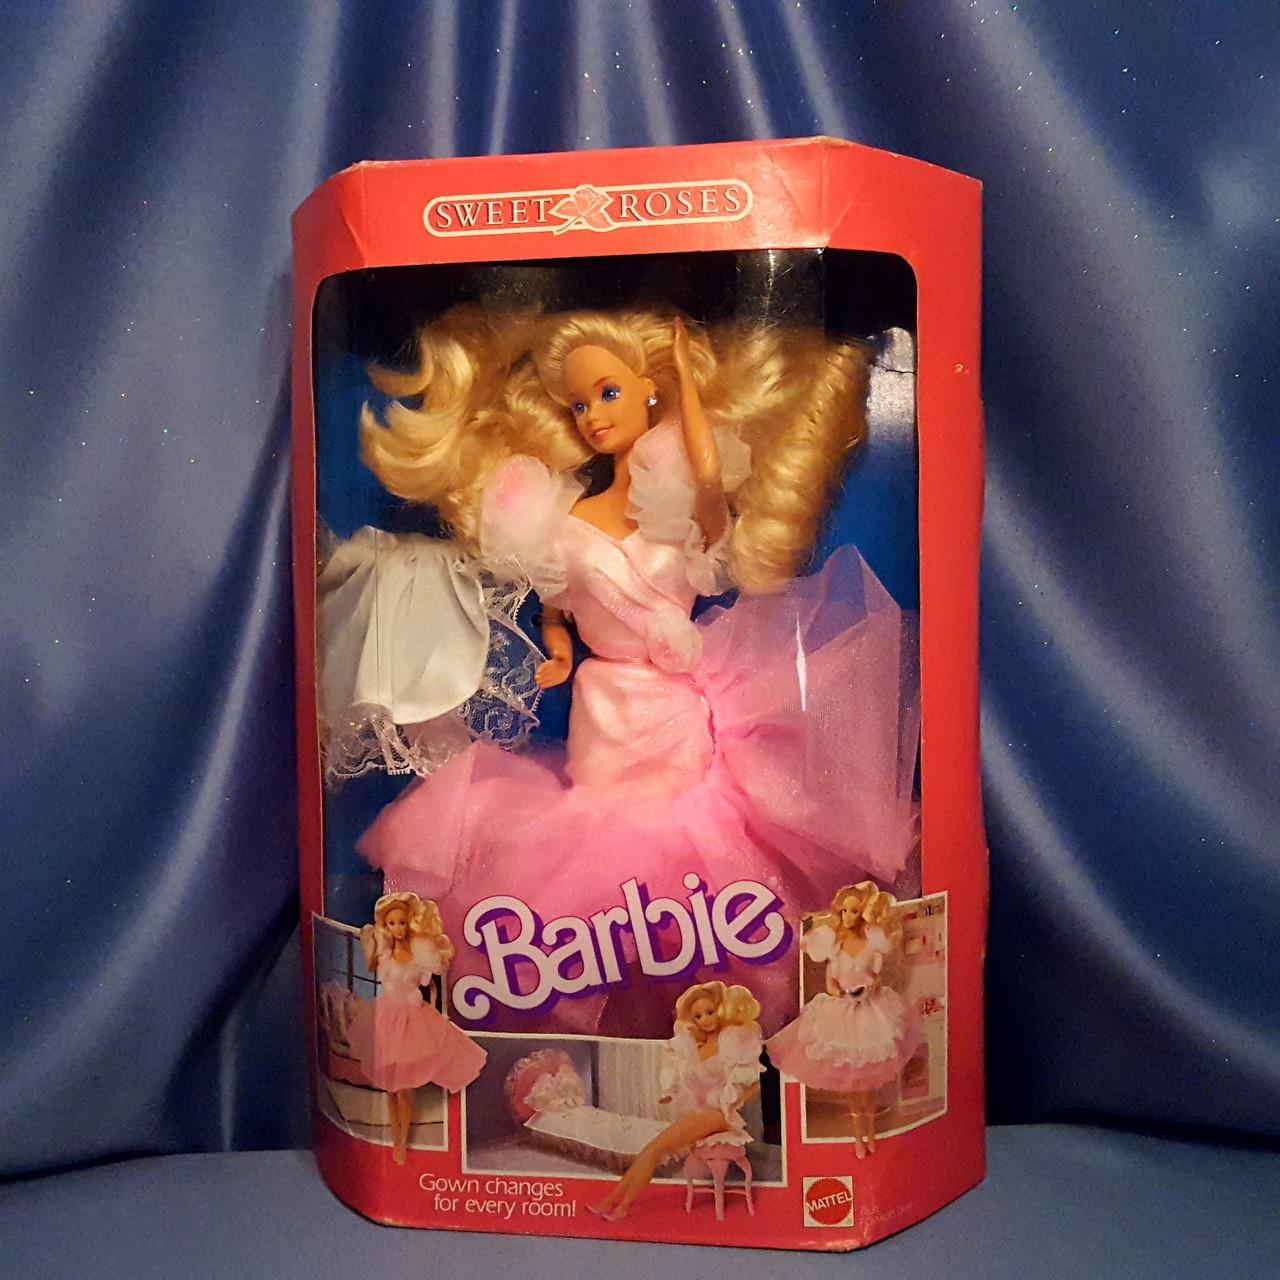 Barbie - Sweet Roses by Mattel.